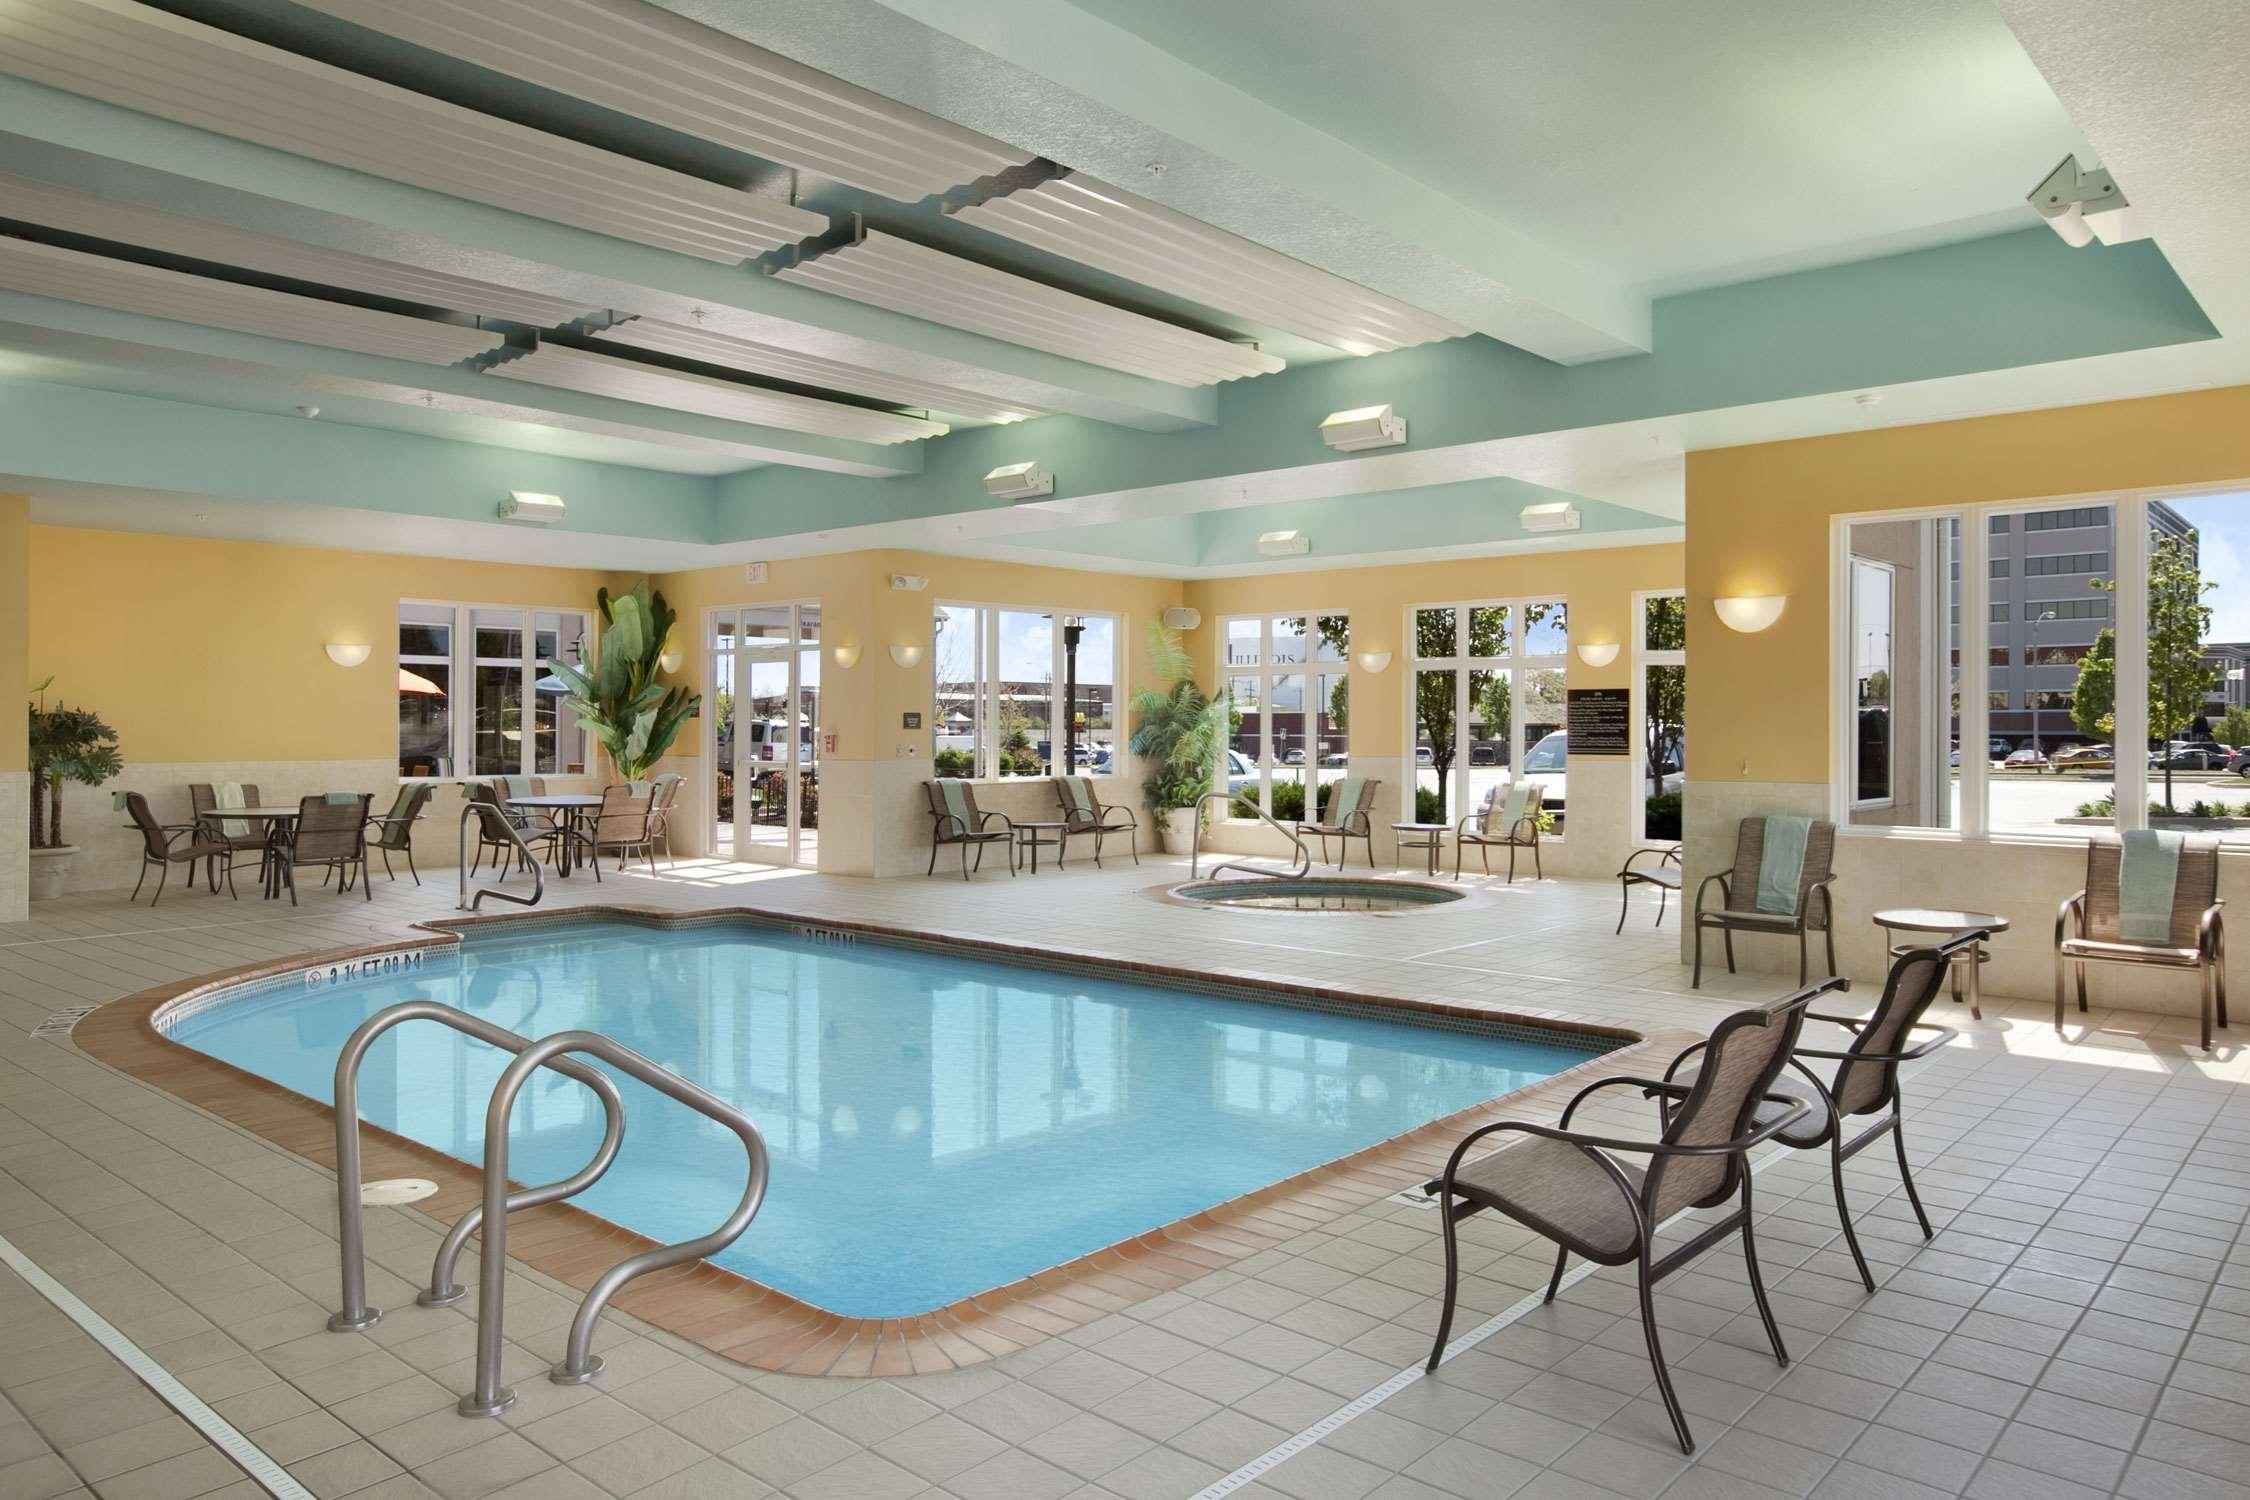 Hilton Garden Inn Champaign/ Urbana image 6